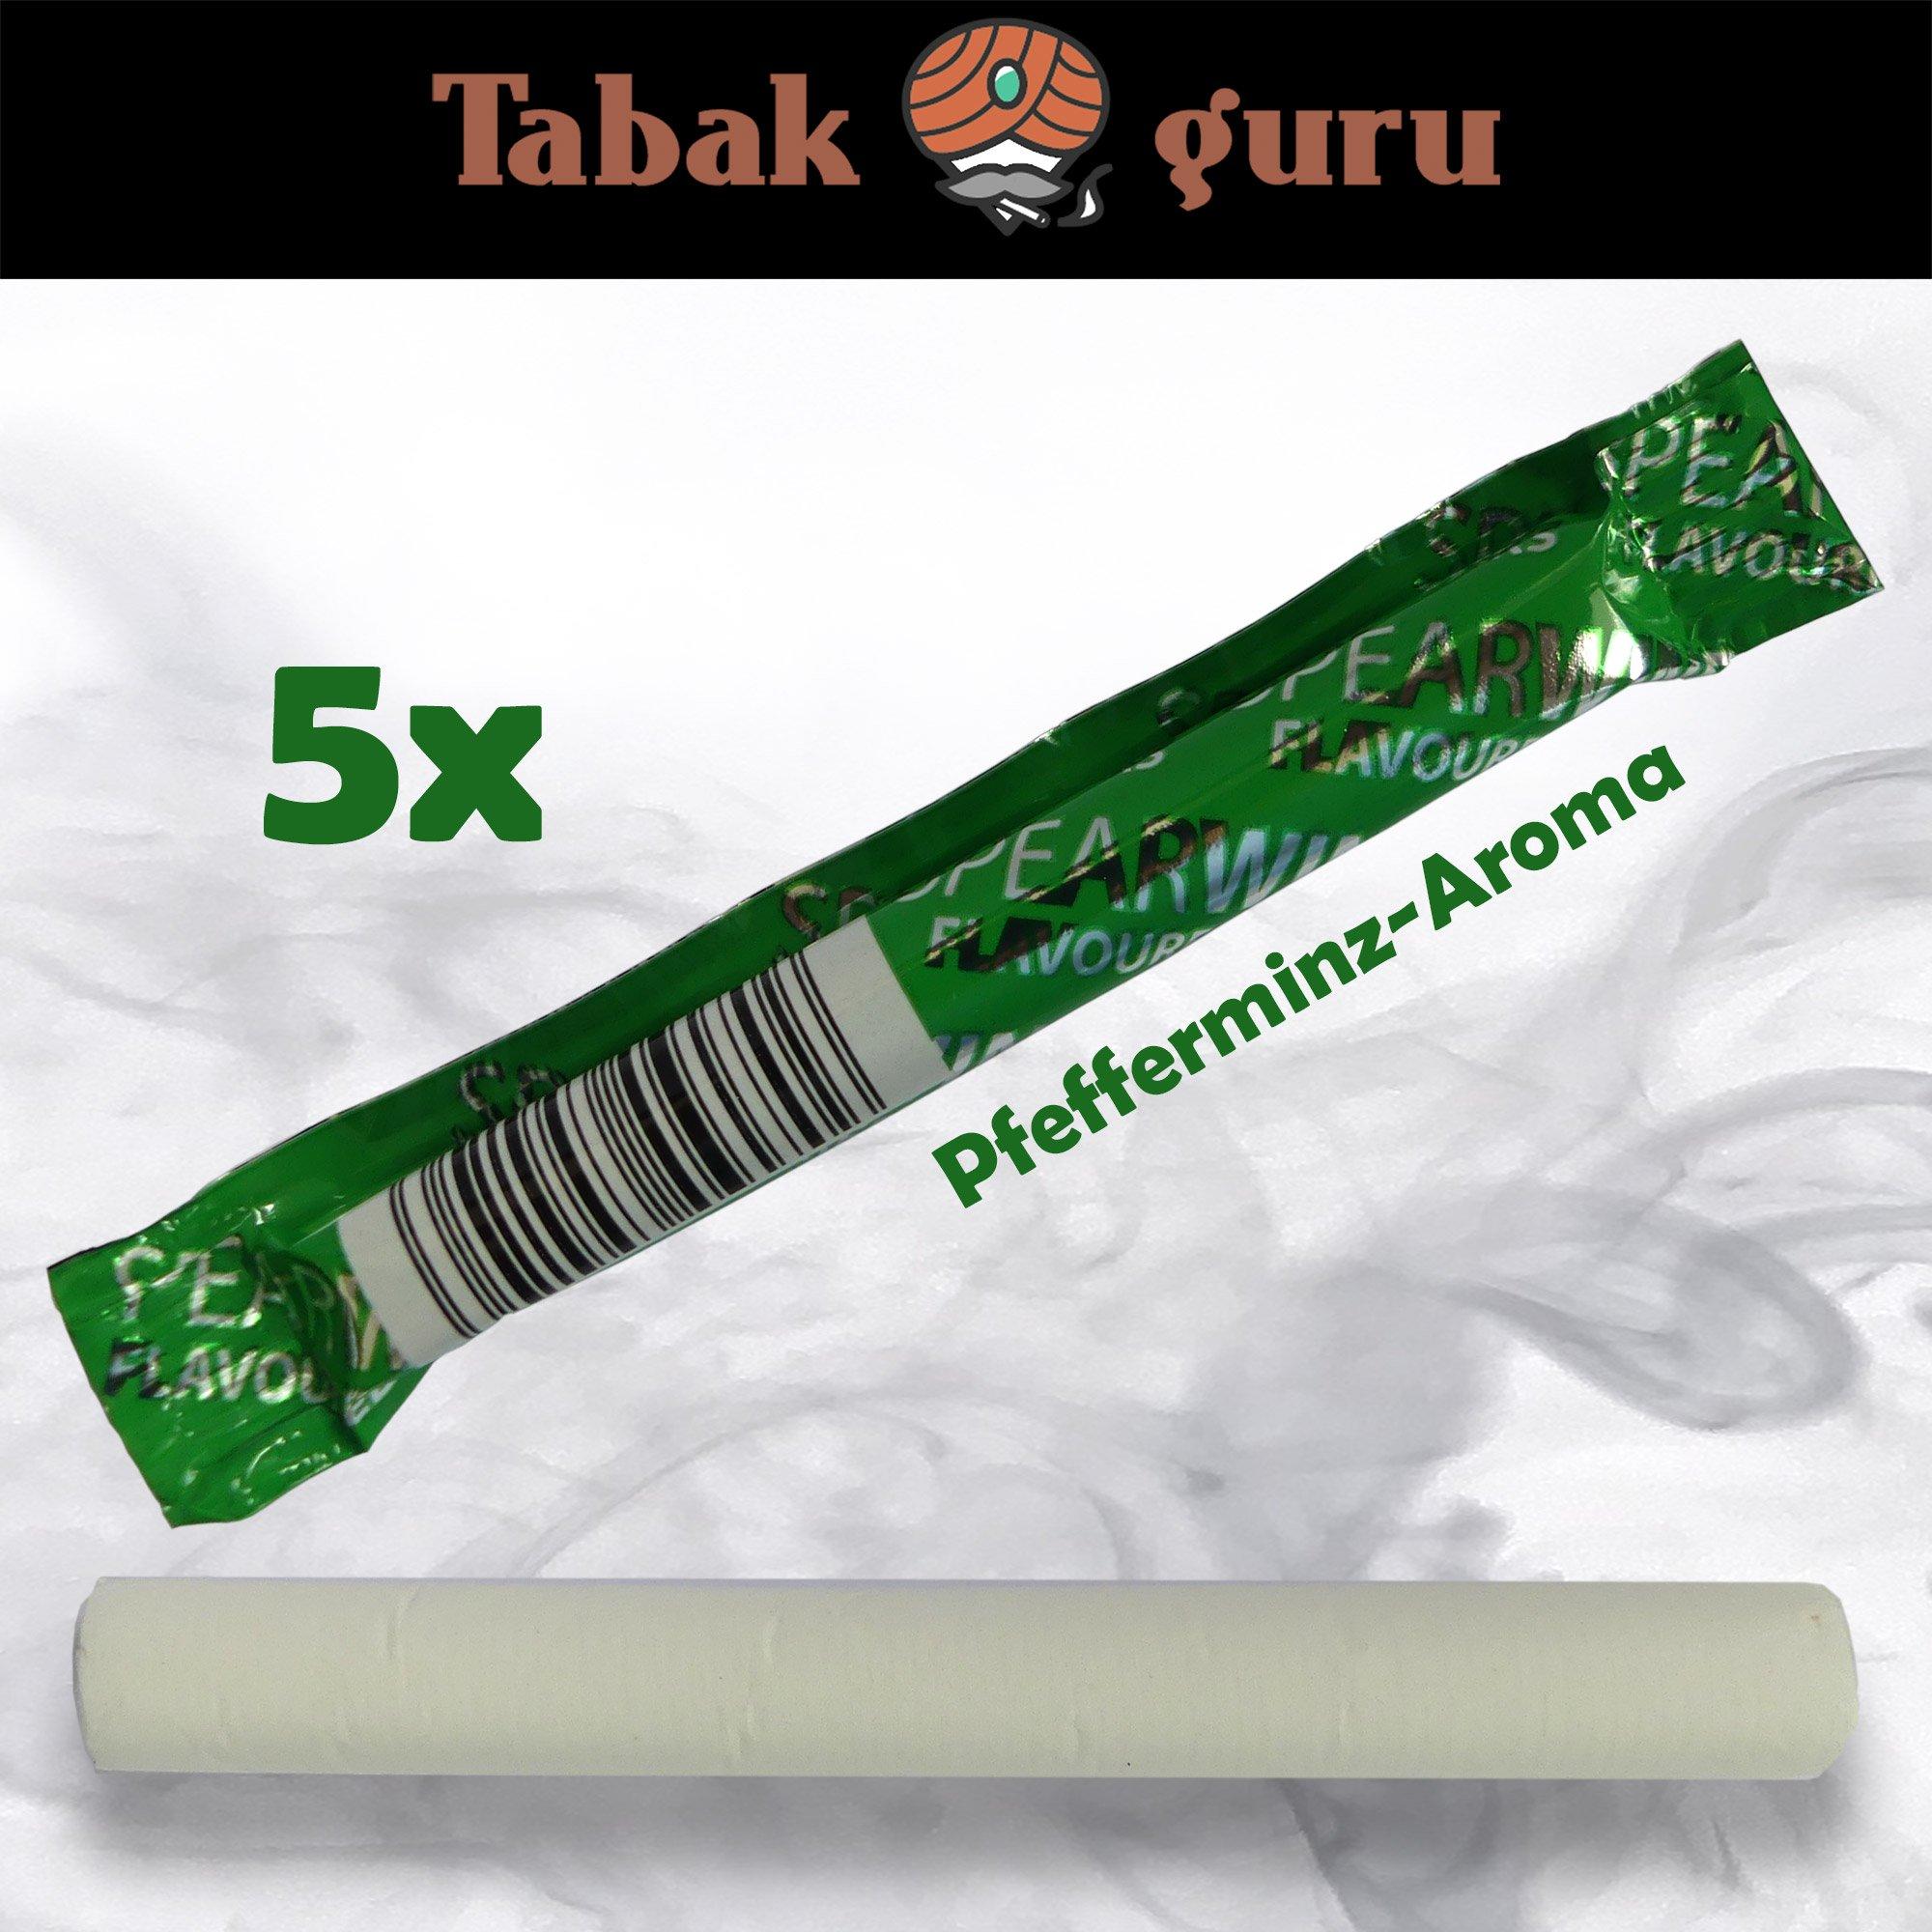 5 x SPEARWIND MINT Pfefferminz-Aroma für Zigaretten & Tabak - Aroma-Sticks